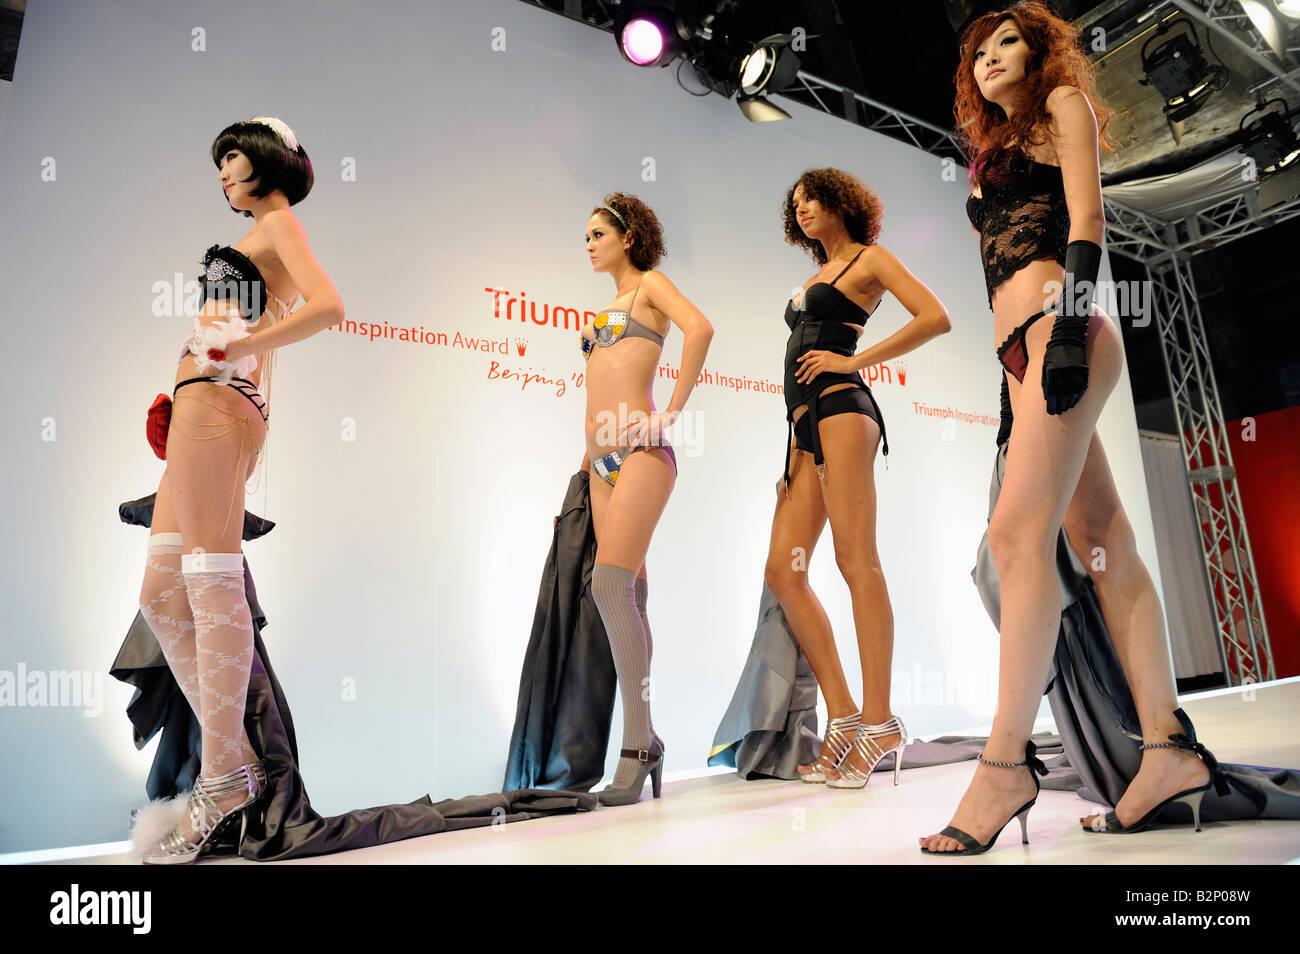 Triumph Inspiration Award 08 final in Beijing, China. 31-Jul-2008 - Stock Image